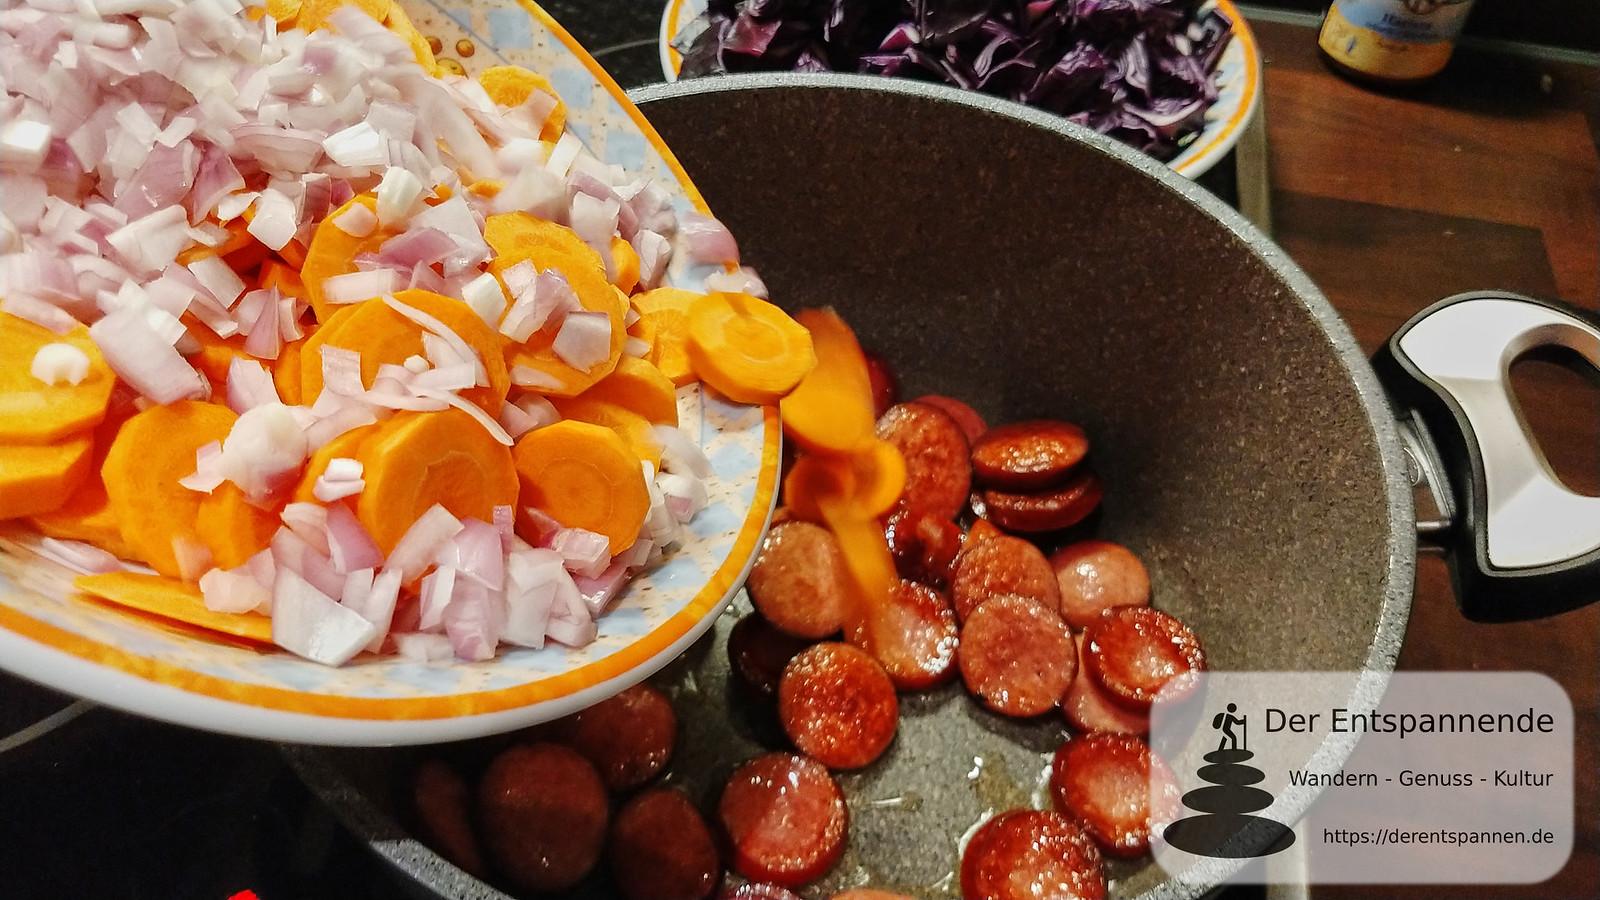 Cabanossi-Topf mit Rotkohl, Karotten und Maronen